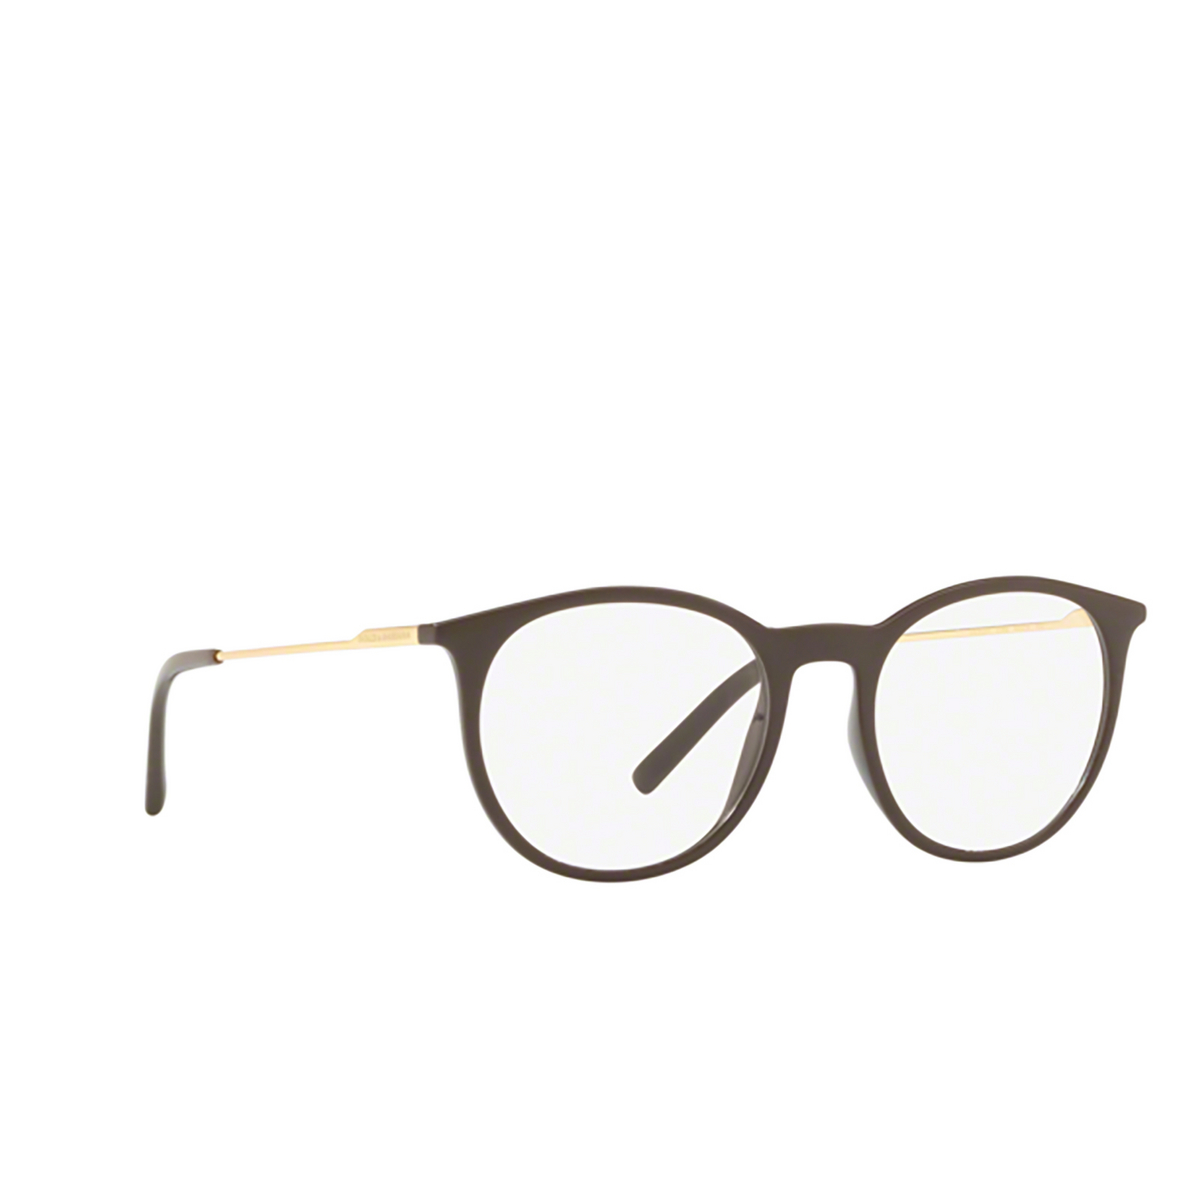 Dolce & Gabbana® Round Eyeglasses: DG5031 color 3042 - three-quarters view.